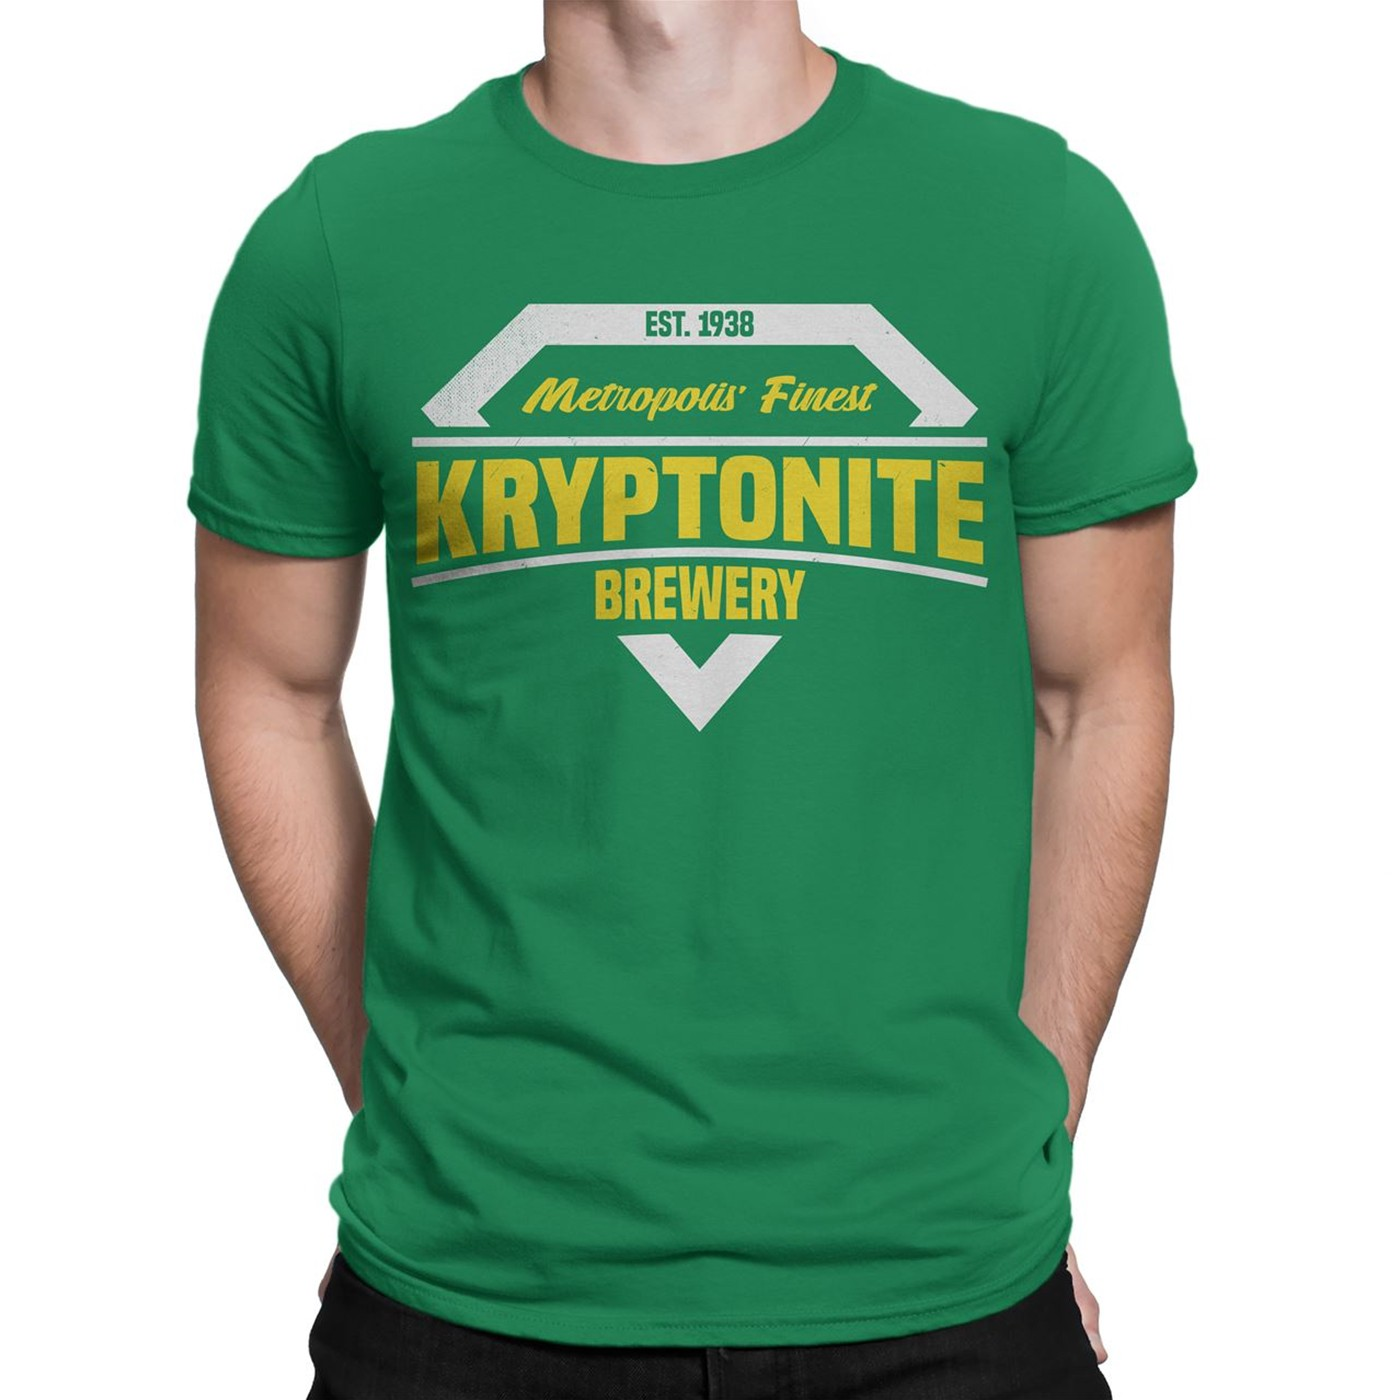 Kryptonite Brewery Men's T-Shirt